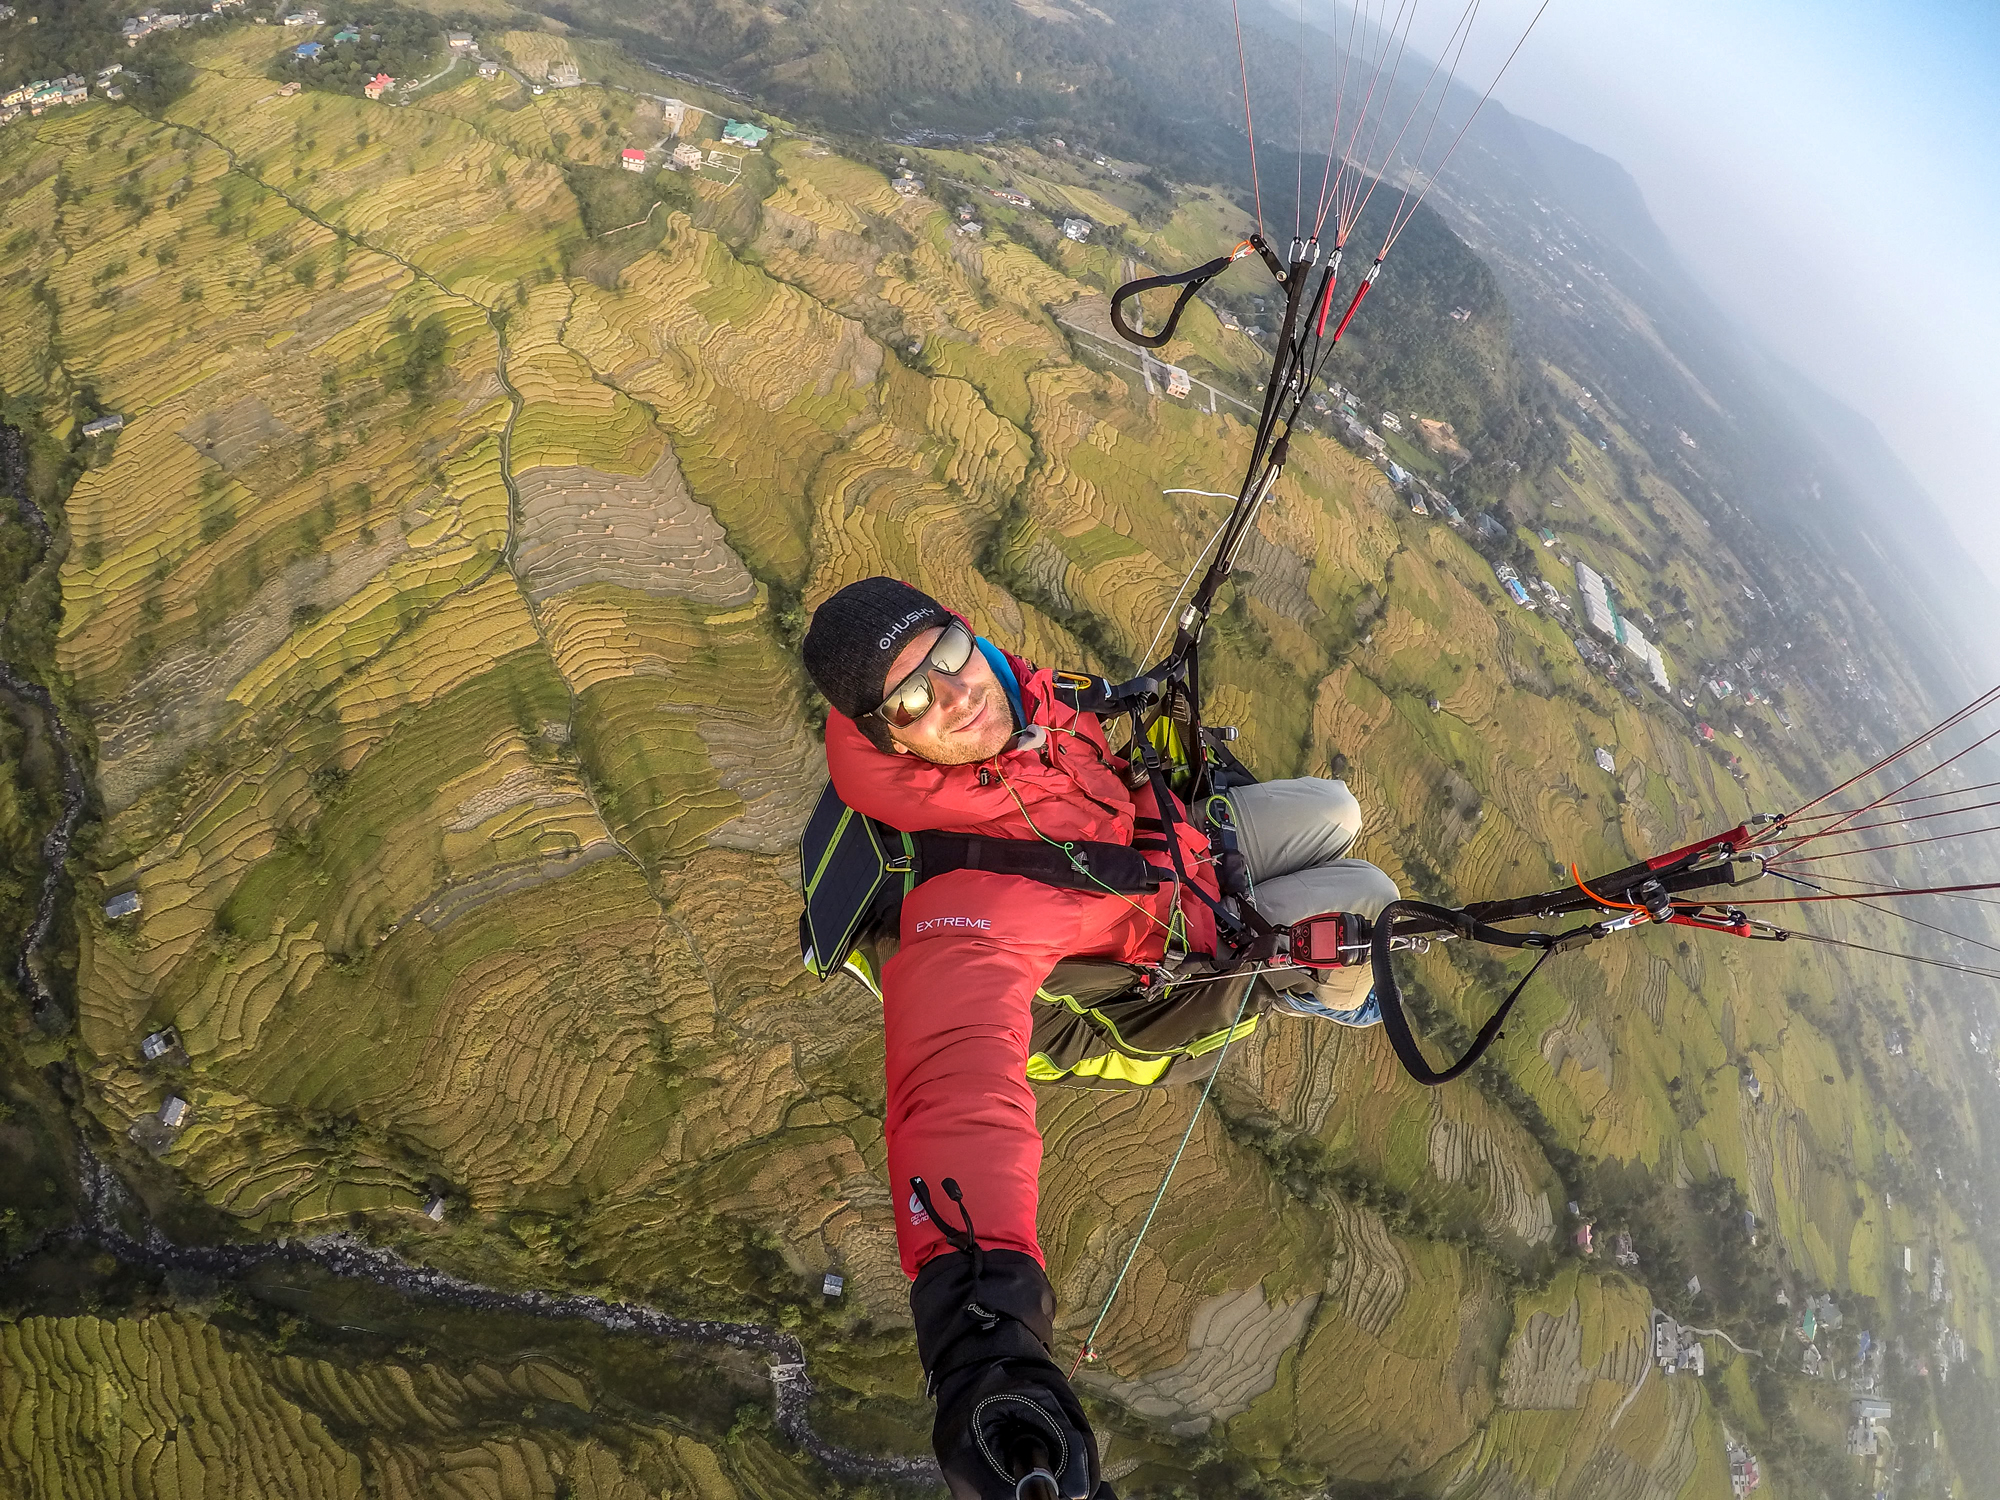 Fly in Bir India Francois Ragolski Husky The Himalayan Paragliding Line (1 of 1)-7